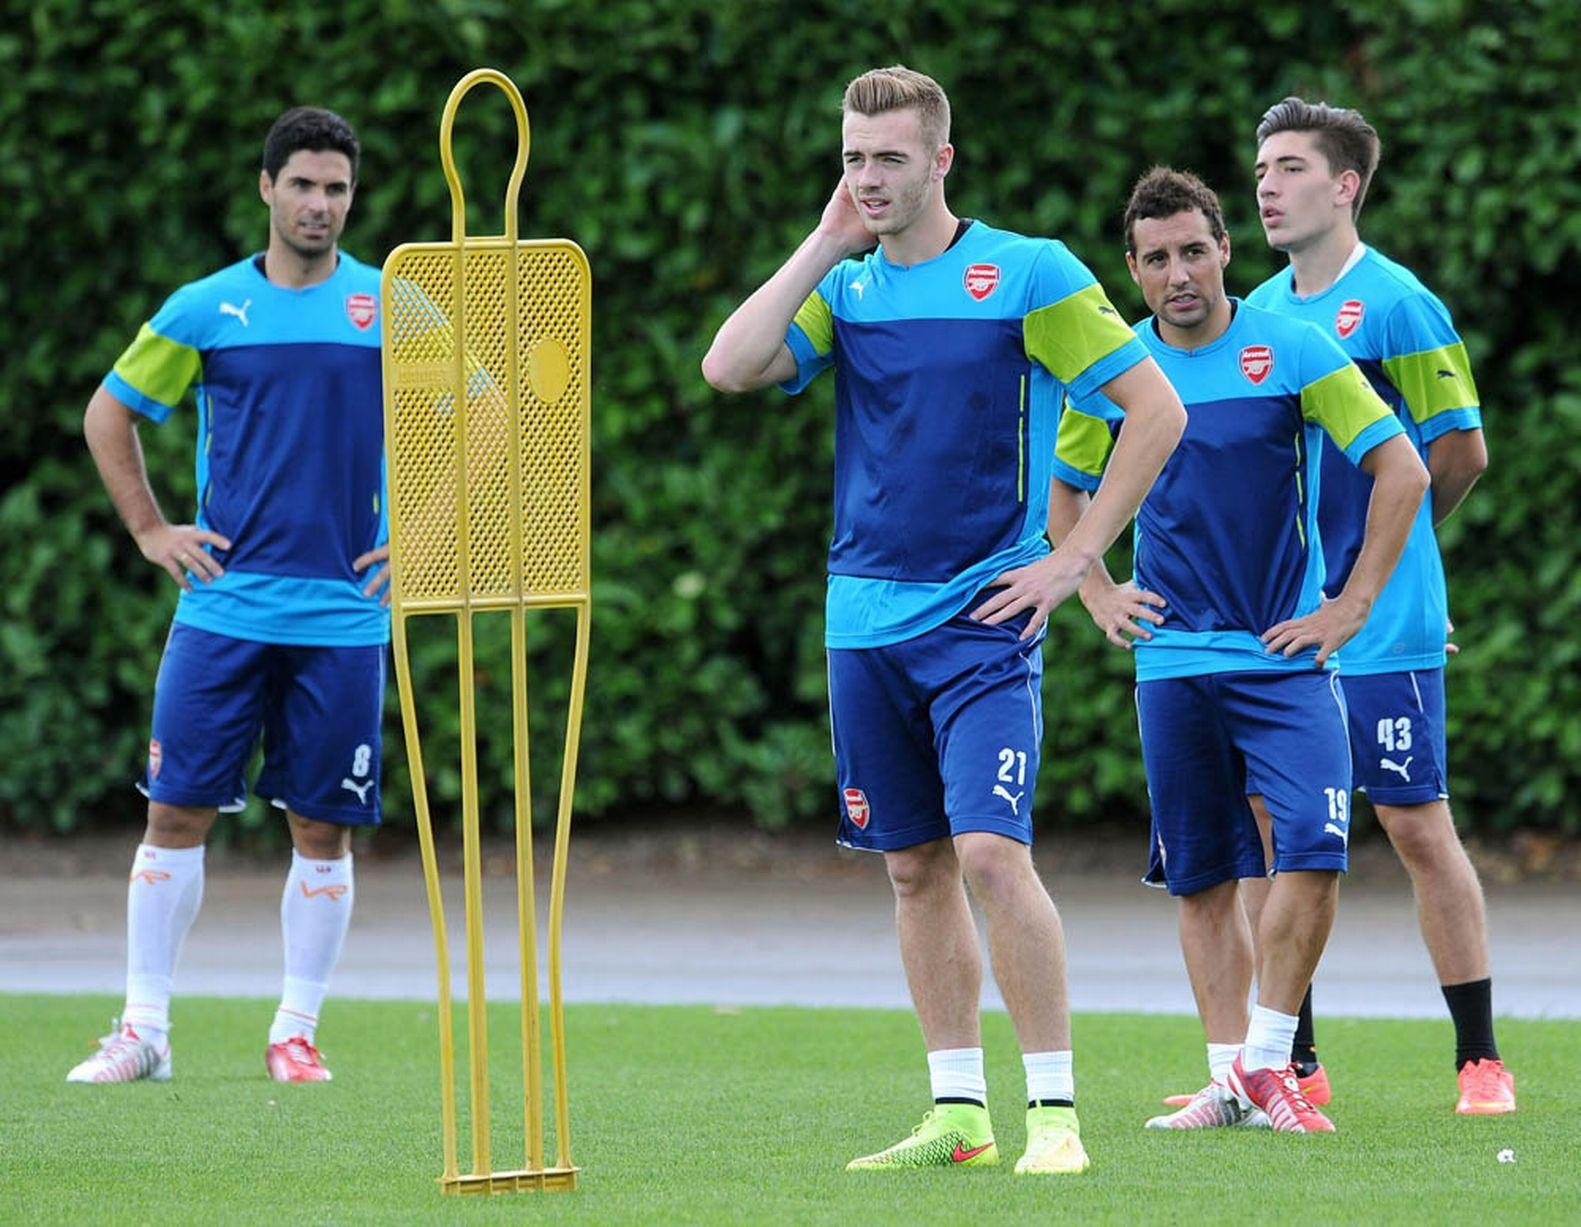 Arsenal-Training-Pics2